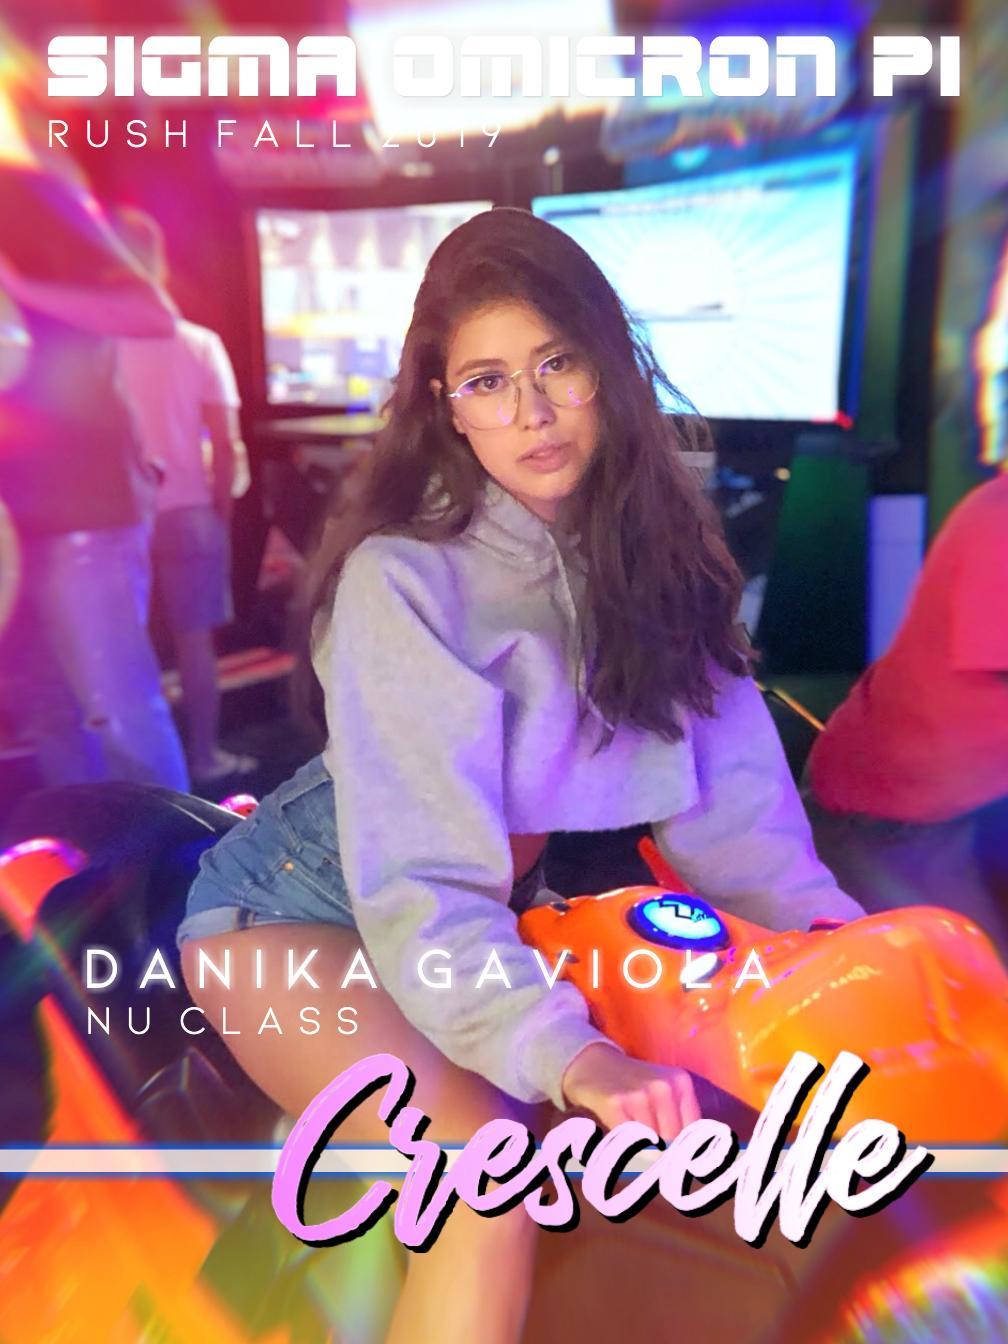 Danika Gaviola